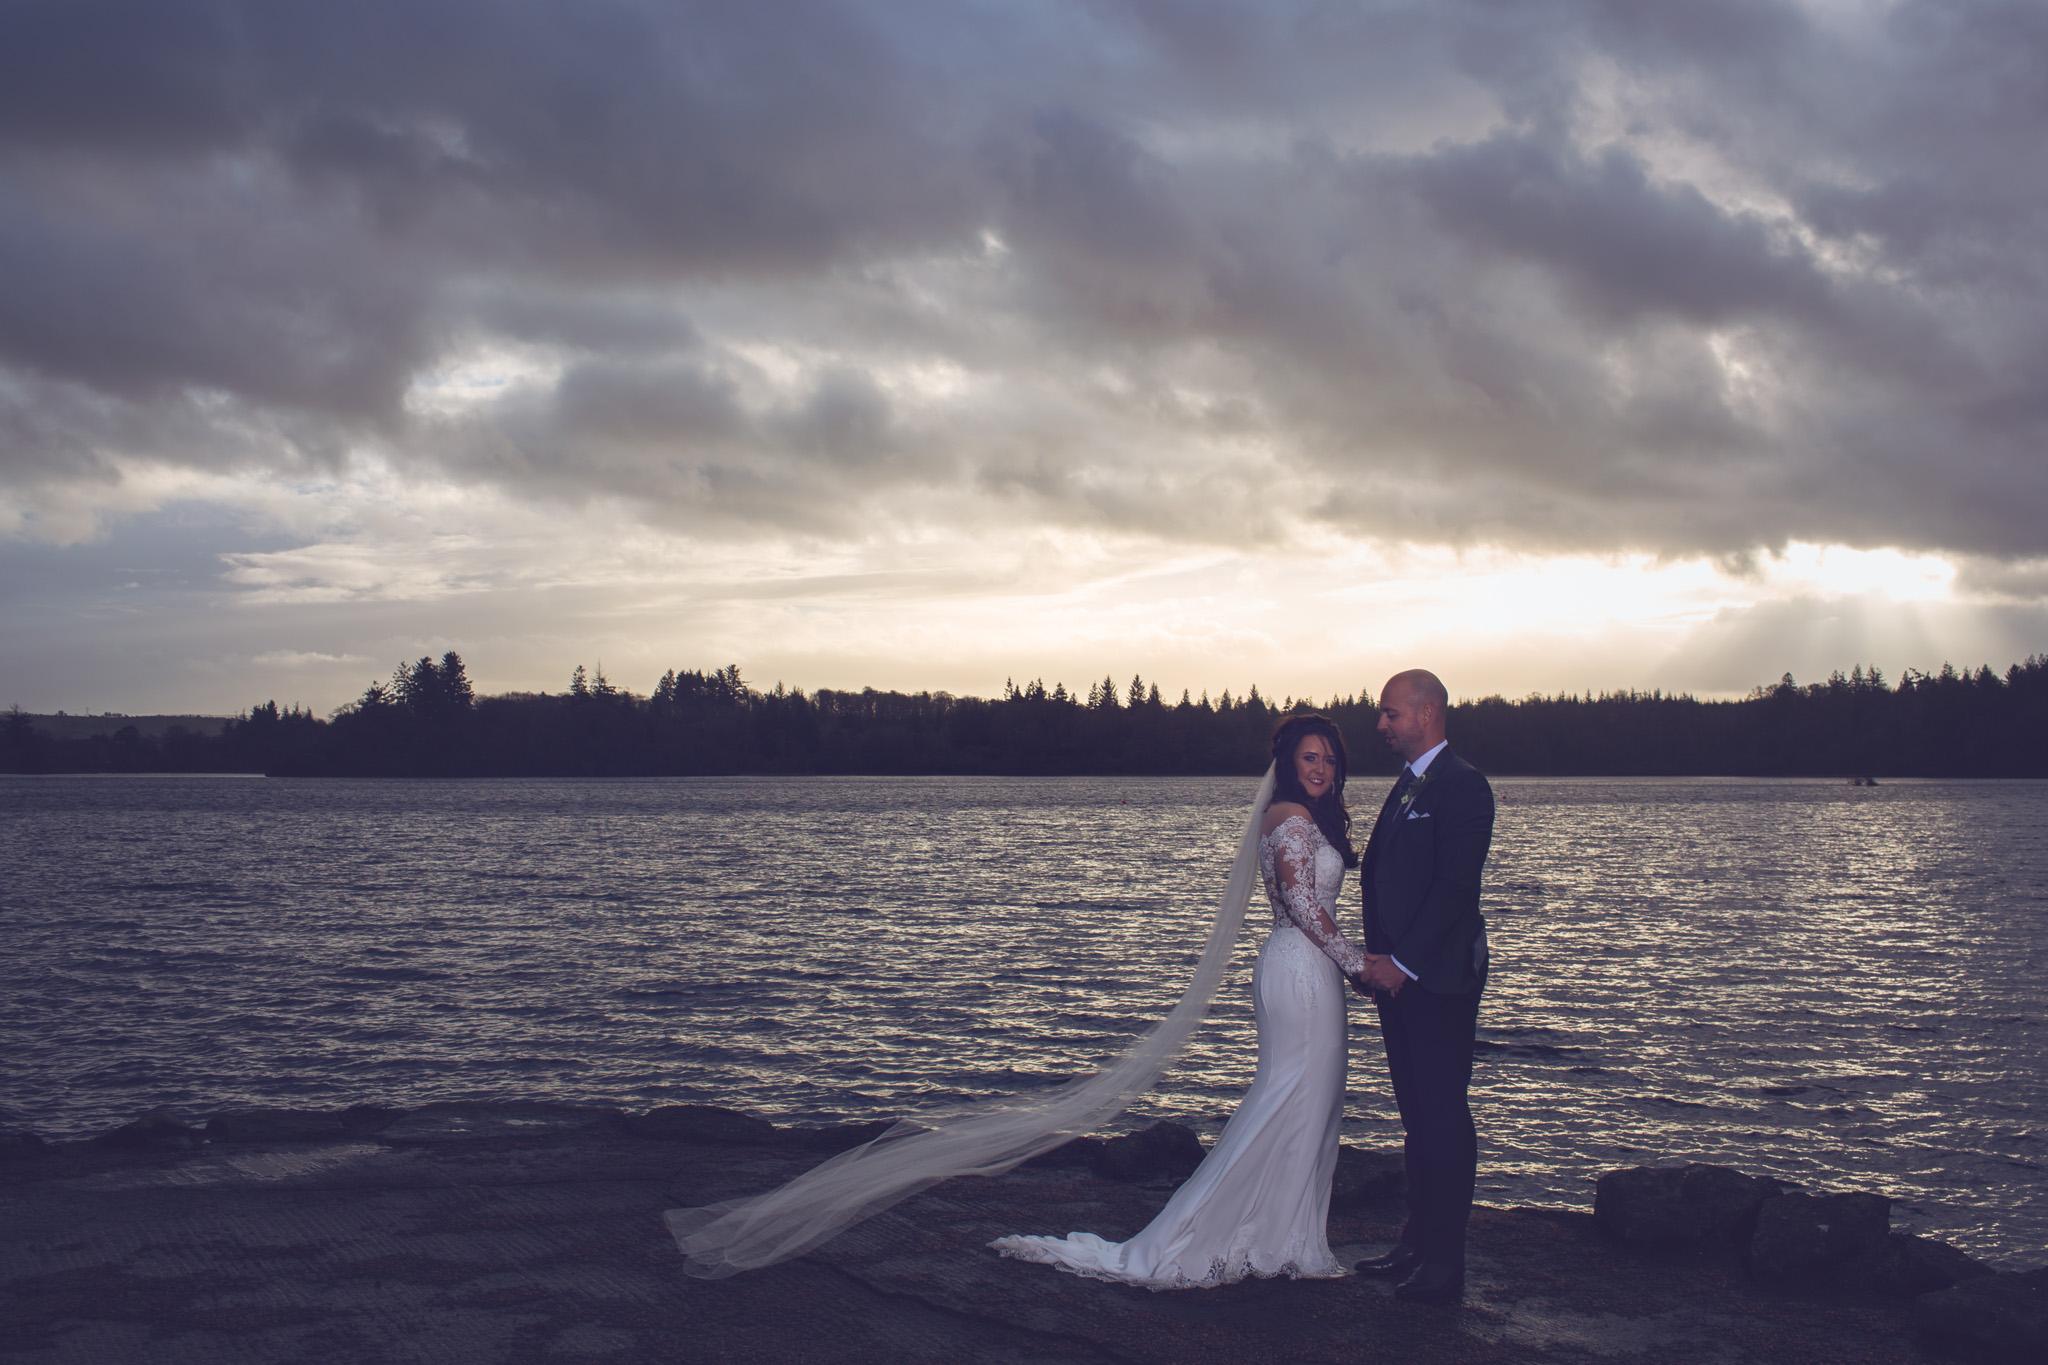 Mark_Barnes_Northern_Ireland_wedding_photographer_Harveys_Point_Donegall_Wedding_photography-Adam&Gemma-39.jpg